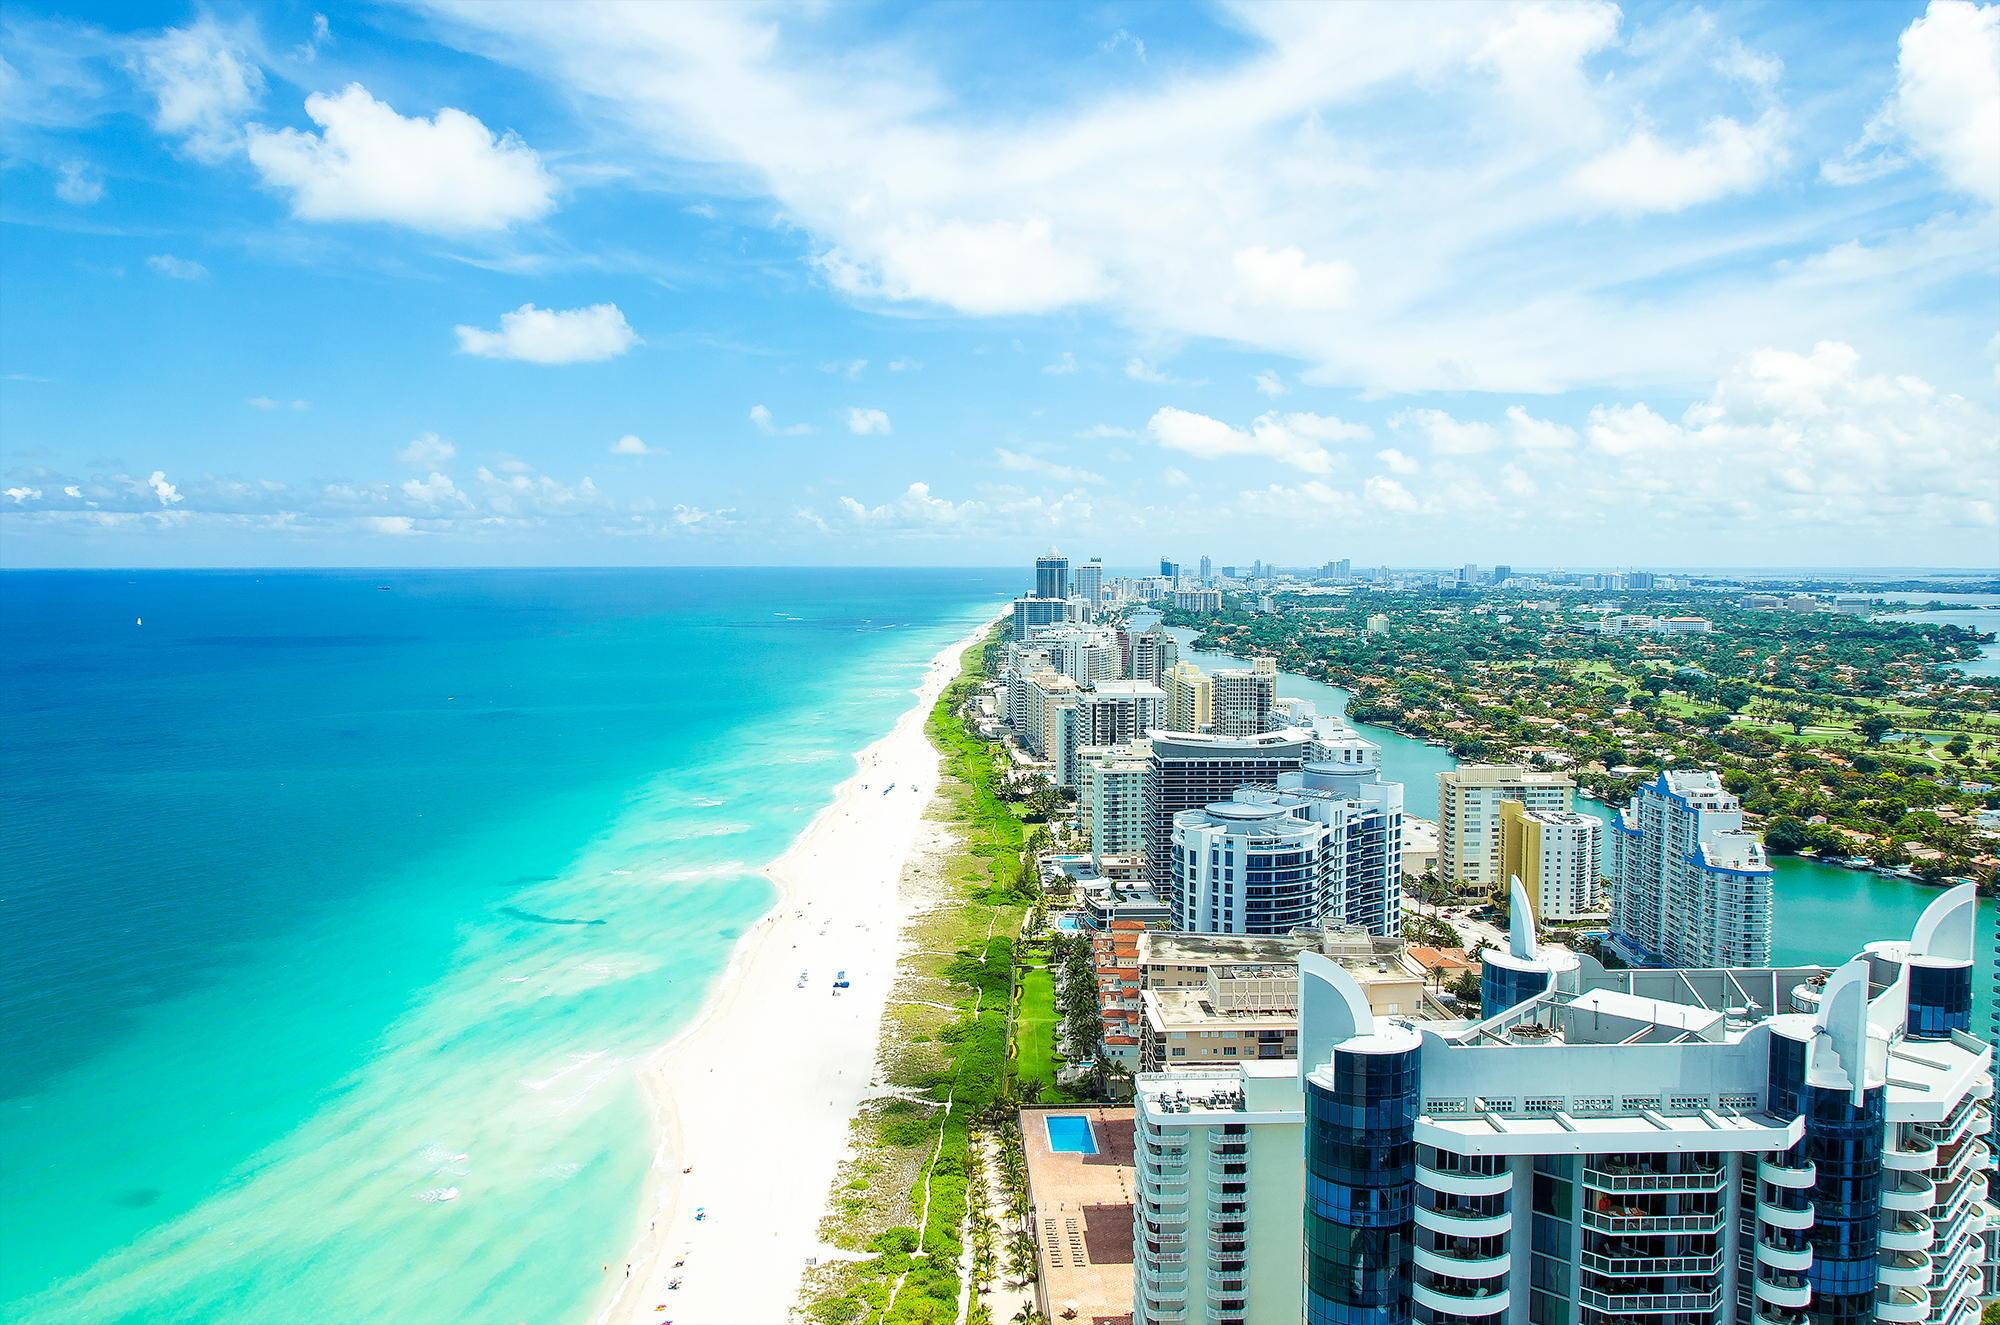 Miami fl florida miami summer beach ocean vice city wallpapers 2000x1325